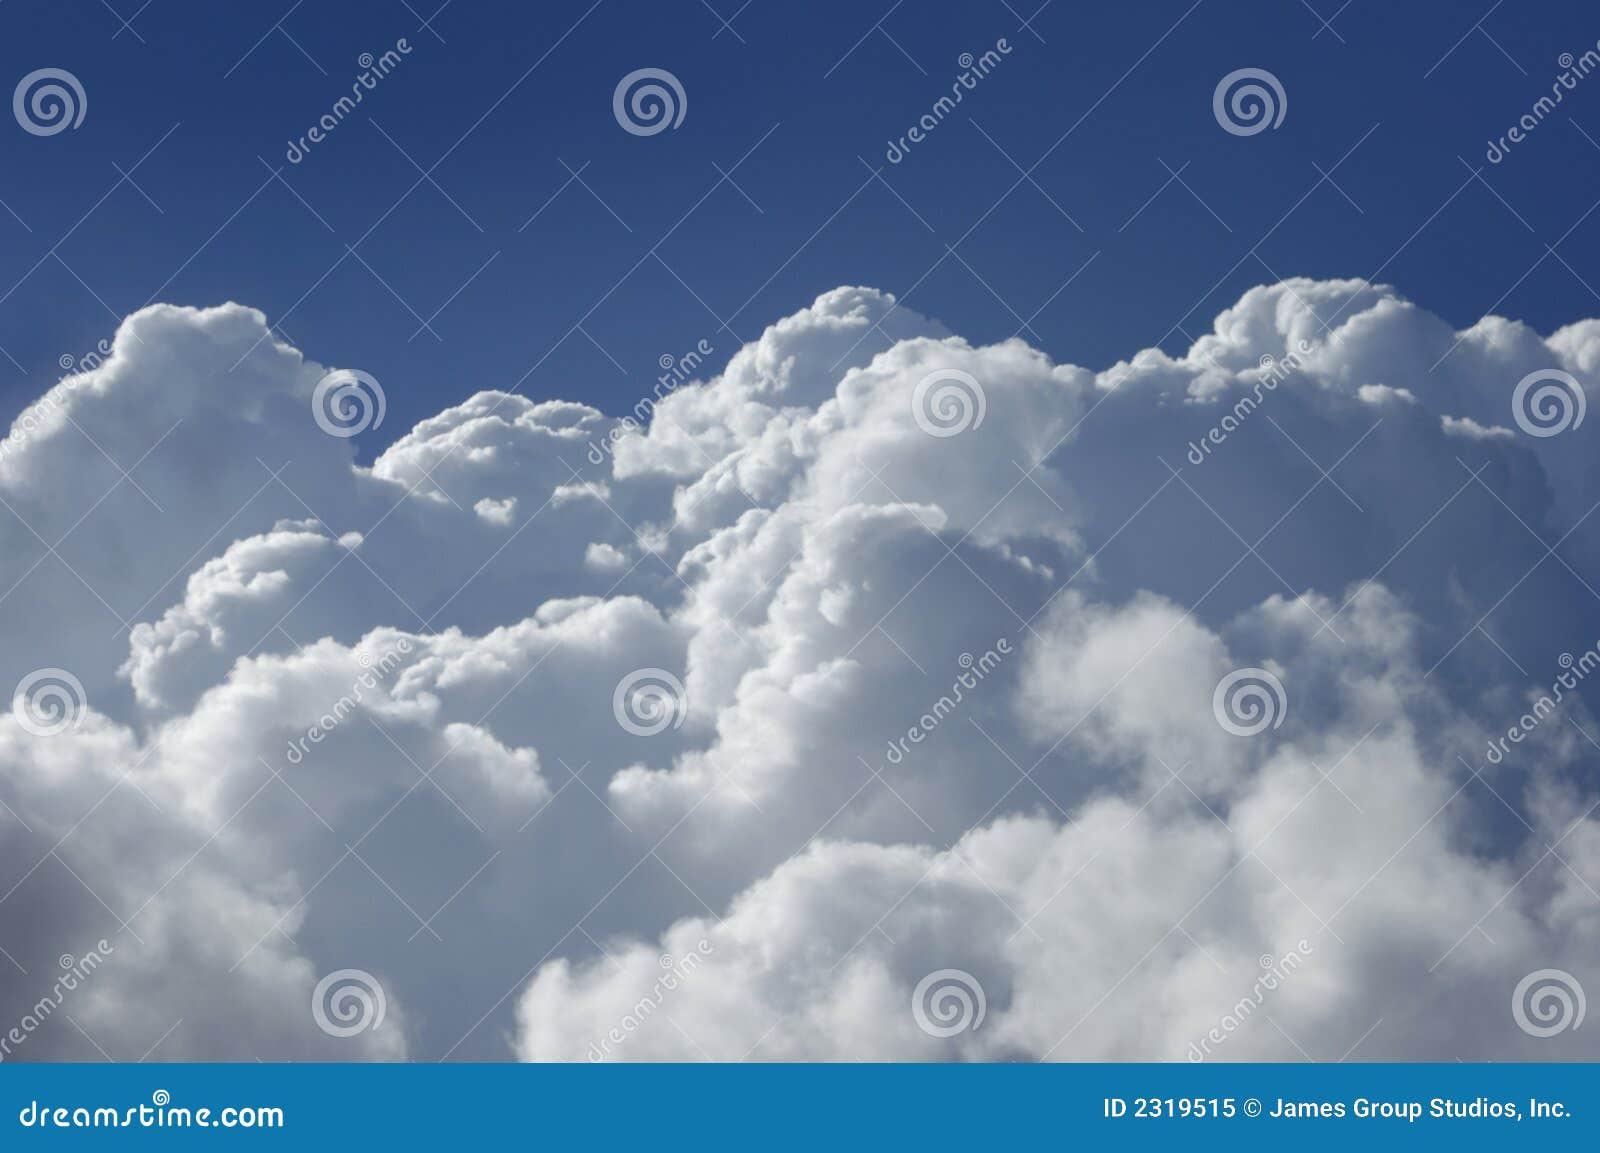 high altitude cumulus clouds stock image image of cloudscape blue